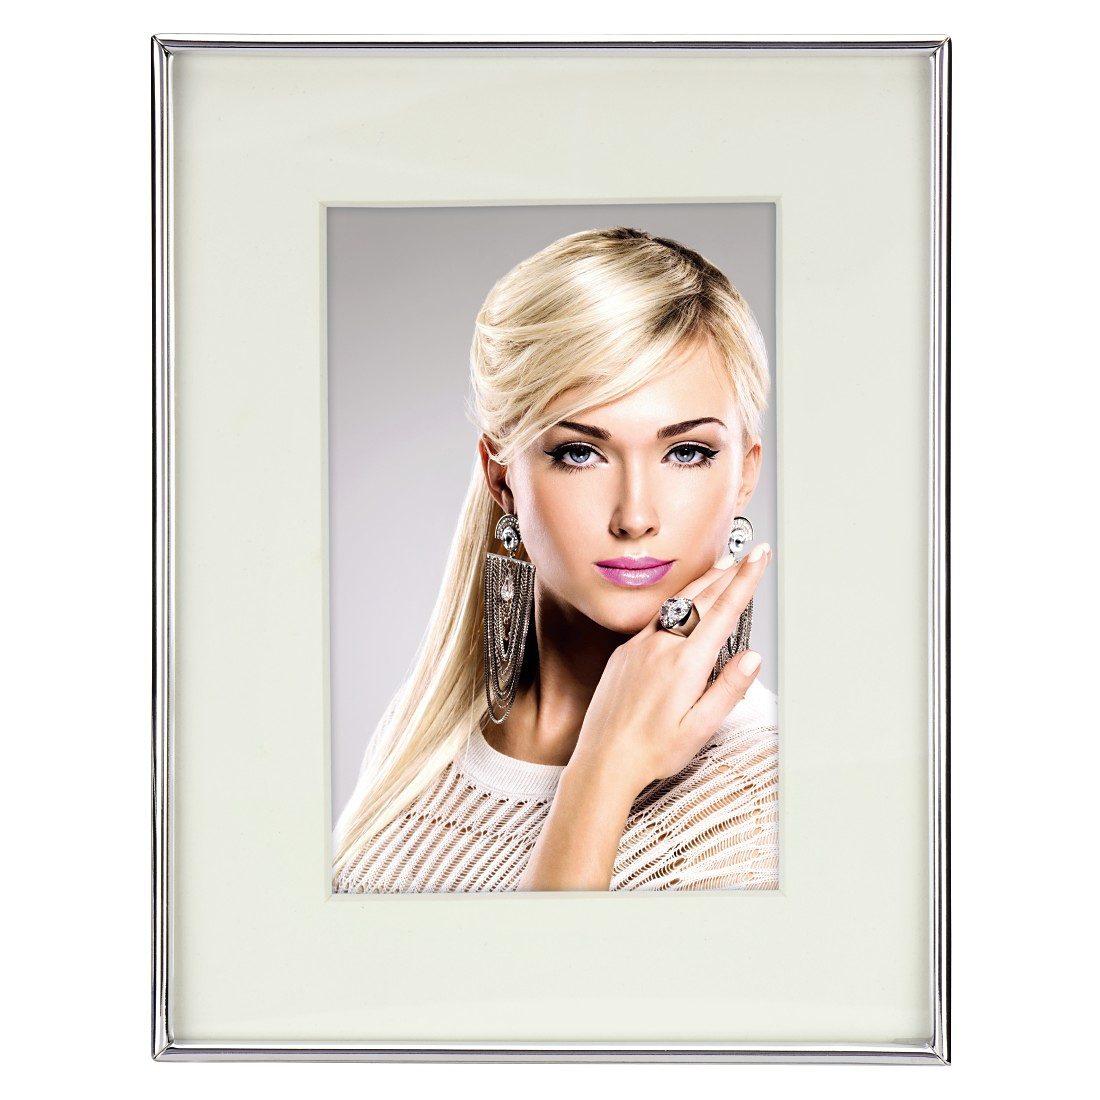 Hama Porträtrahmen Tampere, Silber, weißes Passepartout, 10 x 15 cm